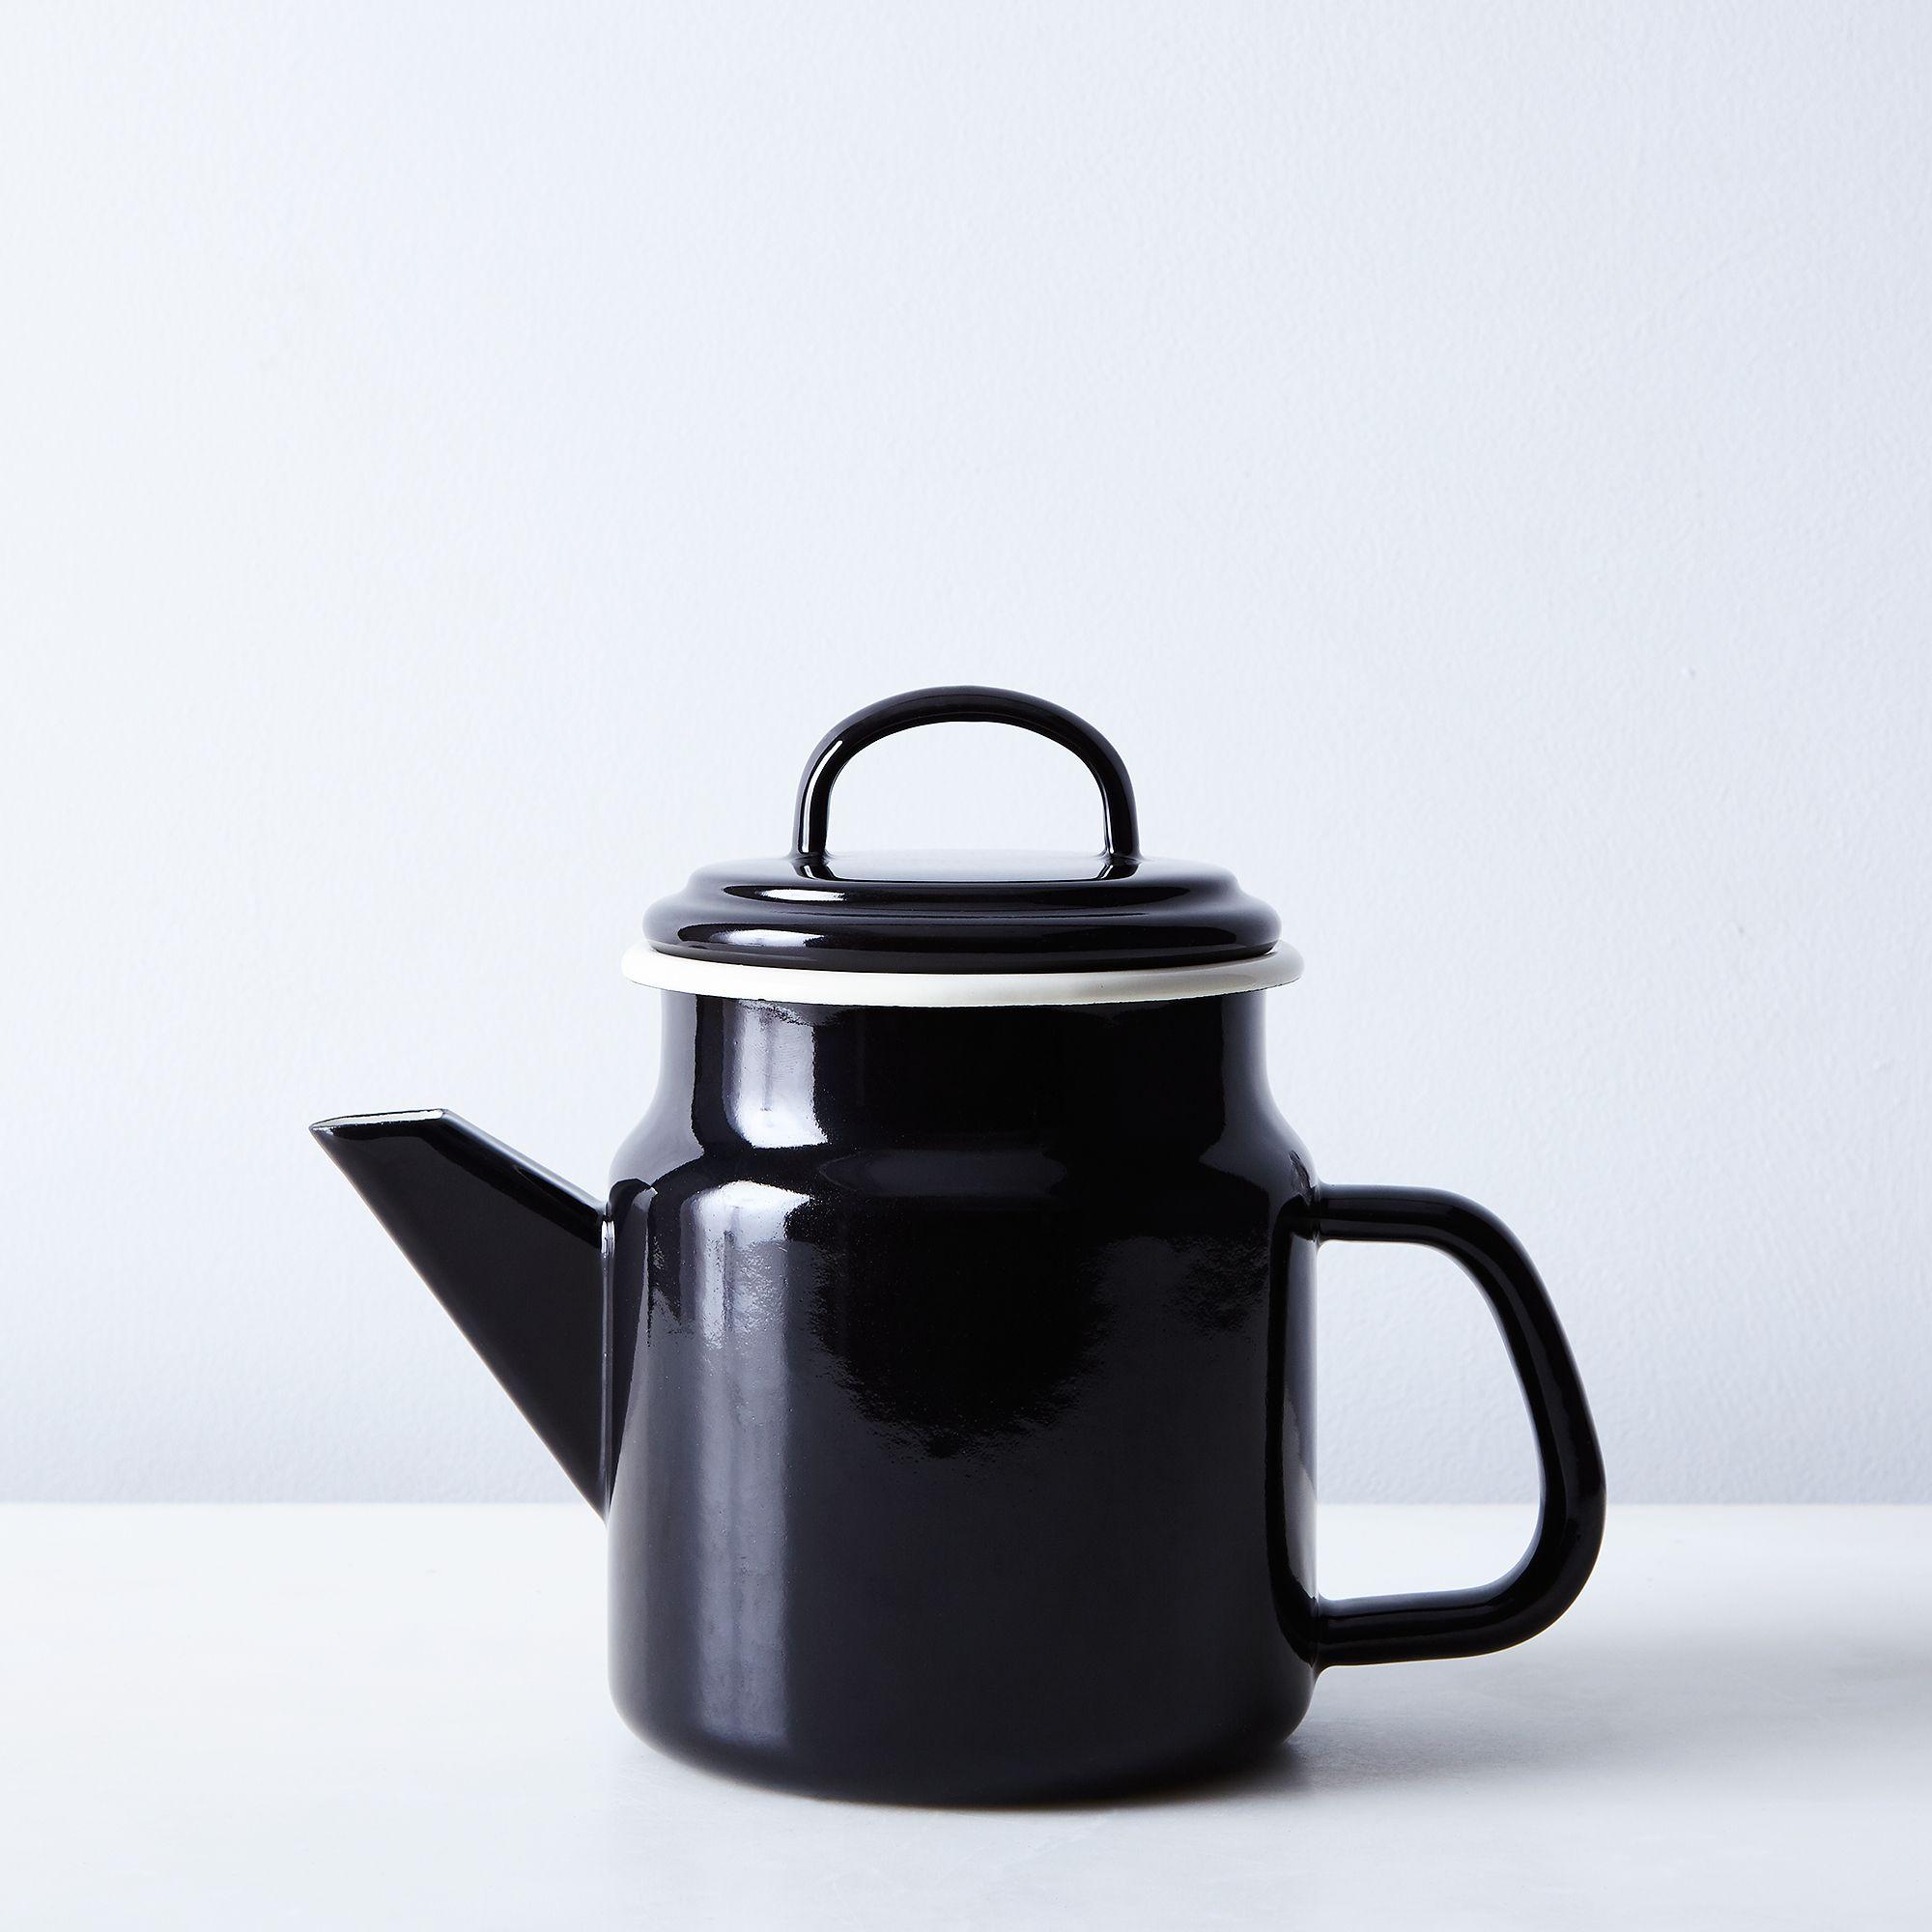 94854ff4 a993 4736 8875 0461a46d3004  2016 1014 dexam home enamel coffee pot 1.2l black silo rocky luten 3648